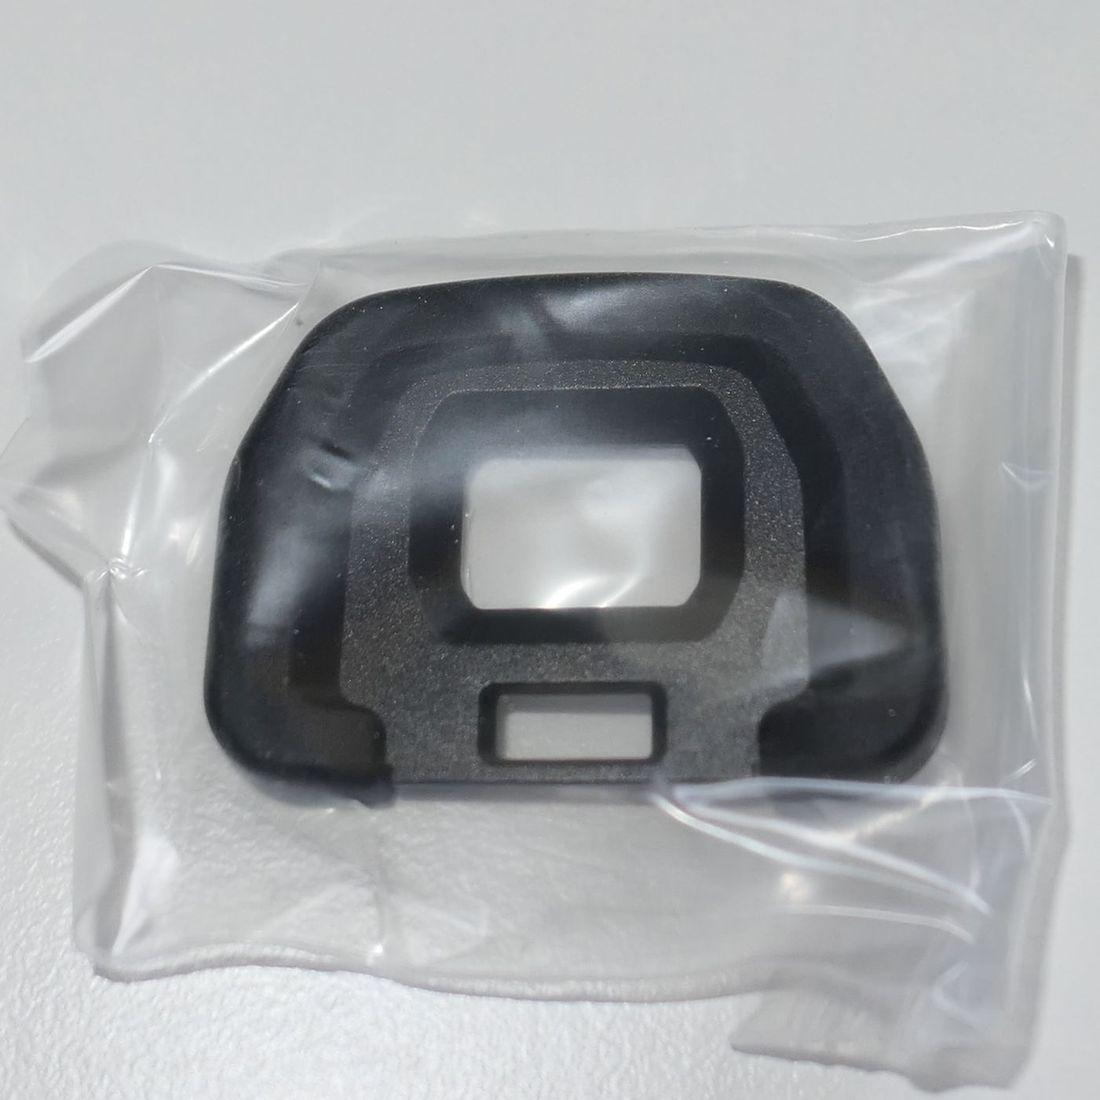 Panasonic Lumix DMC-GH3 GH4 Digital Camera